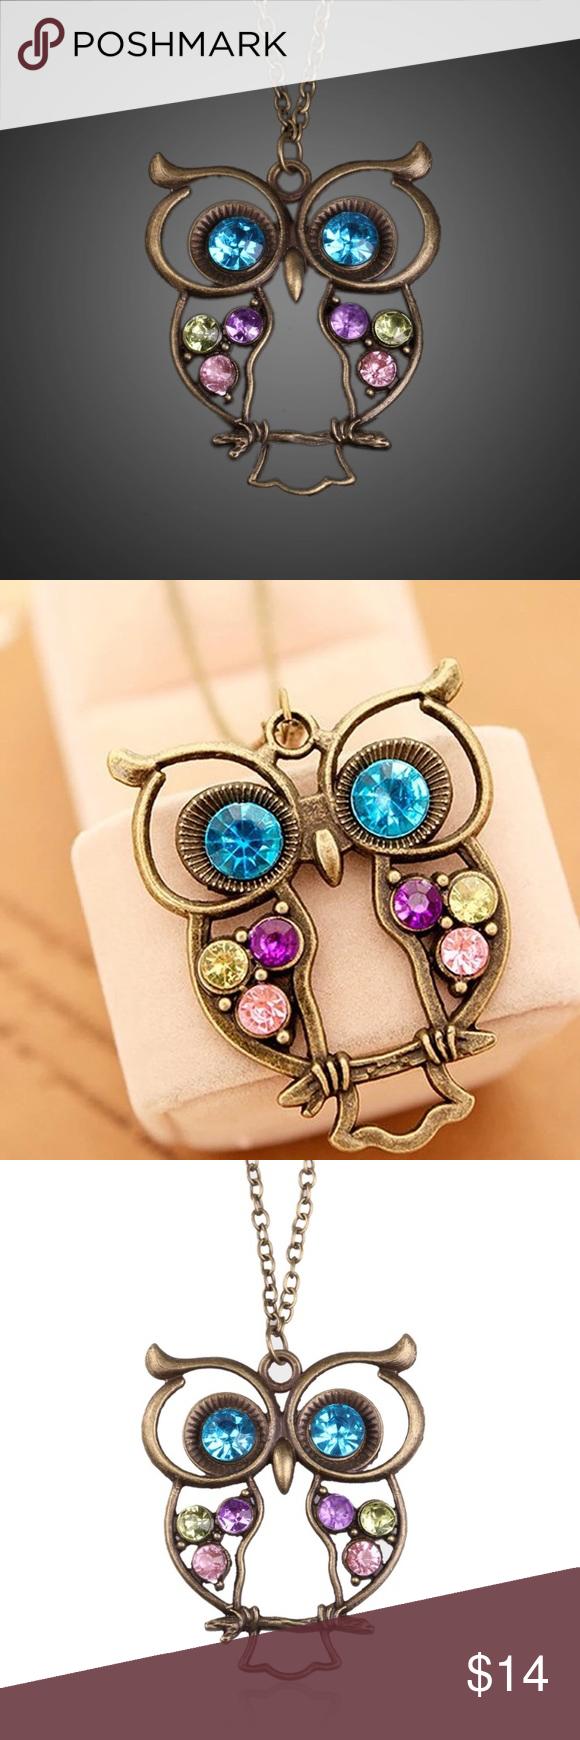 Vintage Bronze Rhinestone Owl Necklace Bronze owl necklace. With colorful rhinestones. Jewelry Necklaces